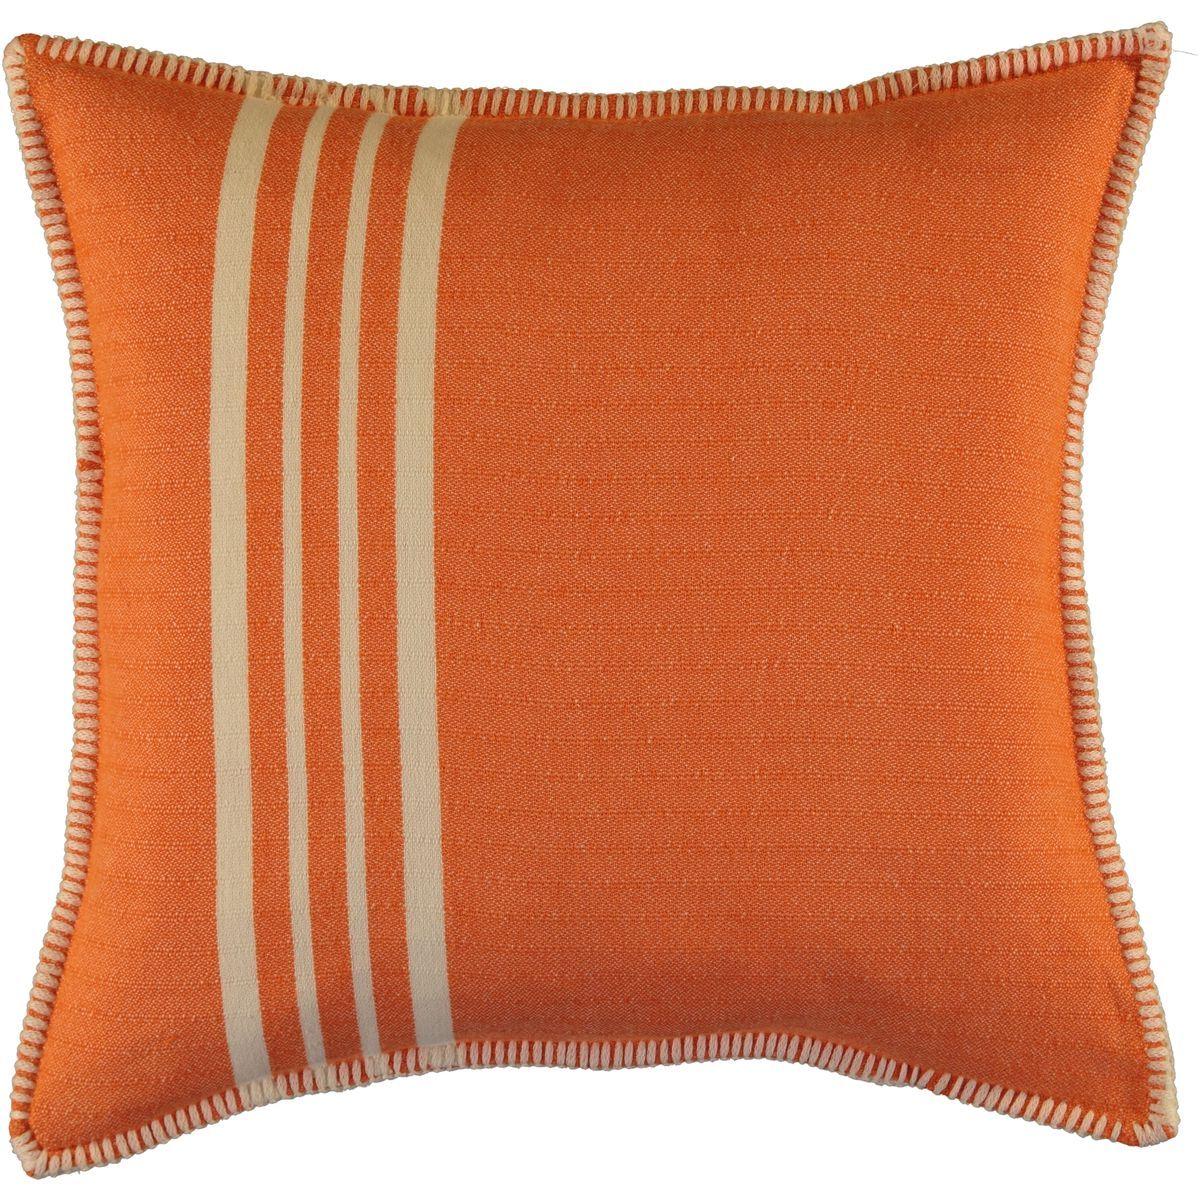 Cushion Cover Sultan - Orange / 45x45